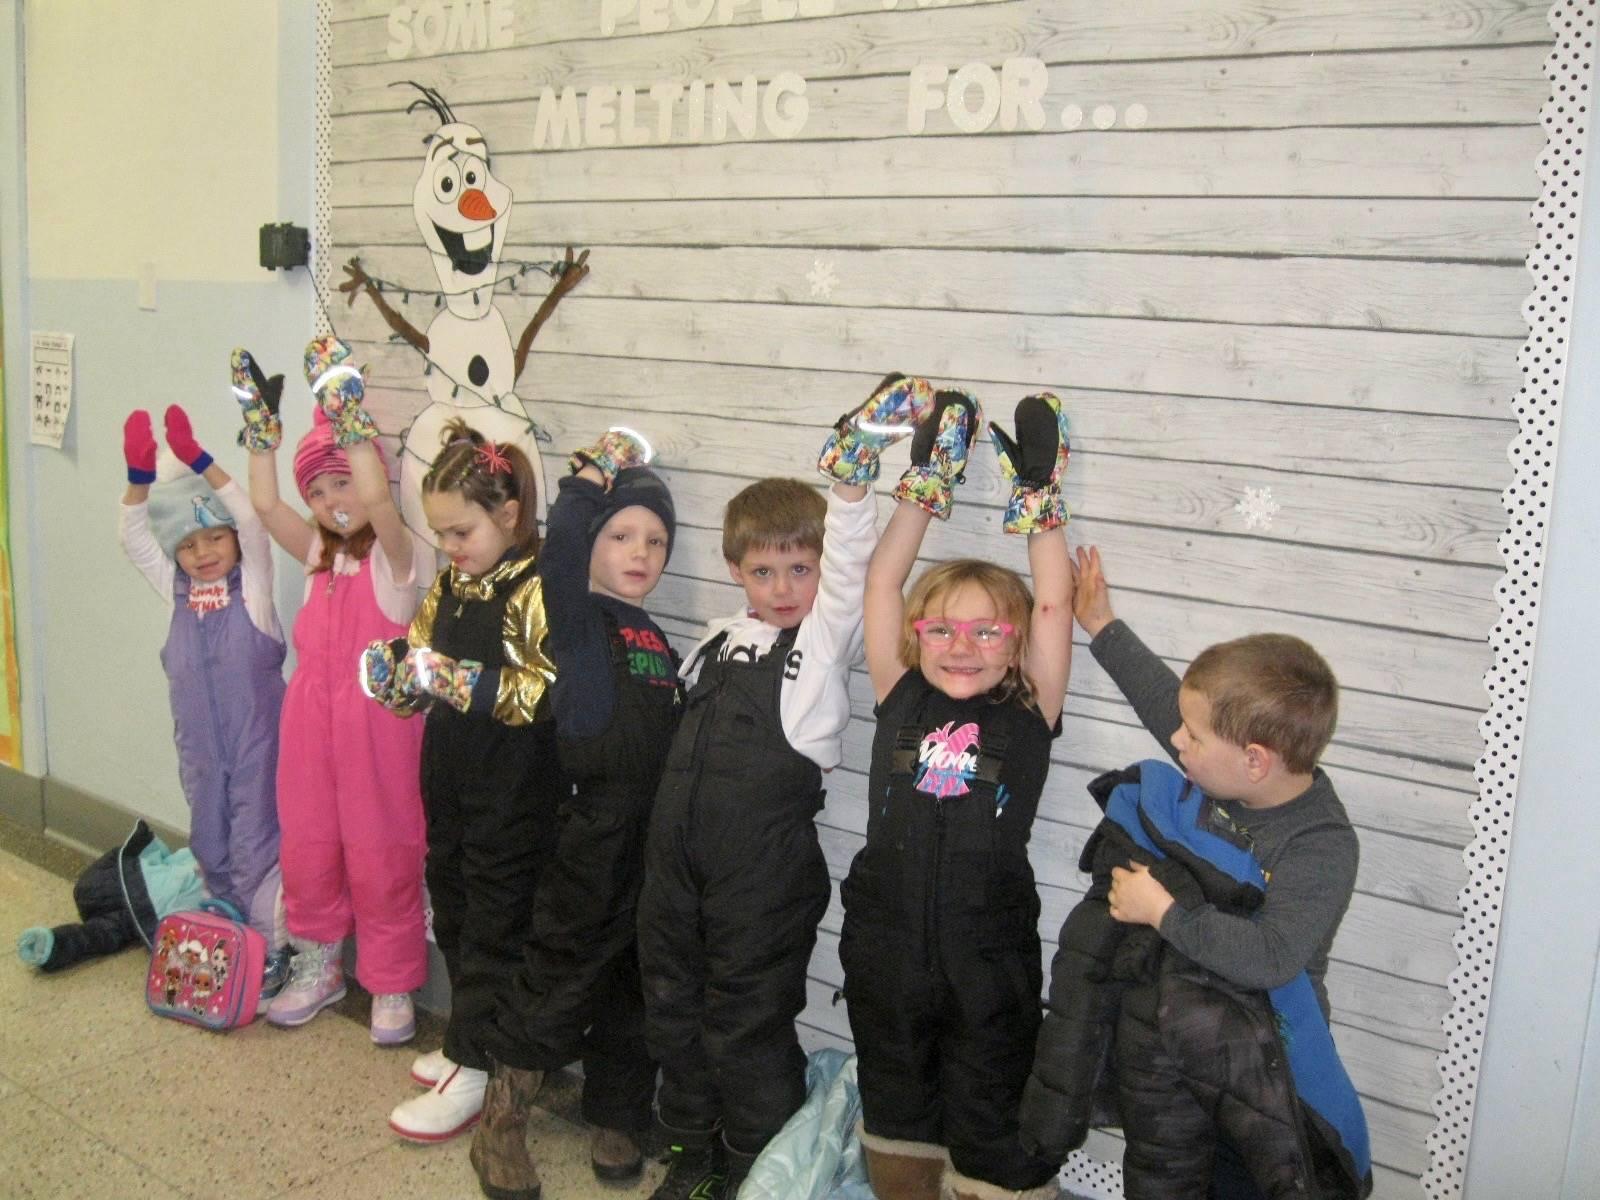 Students hold up mittens donated by Bainbridge Presbyterian Church.